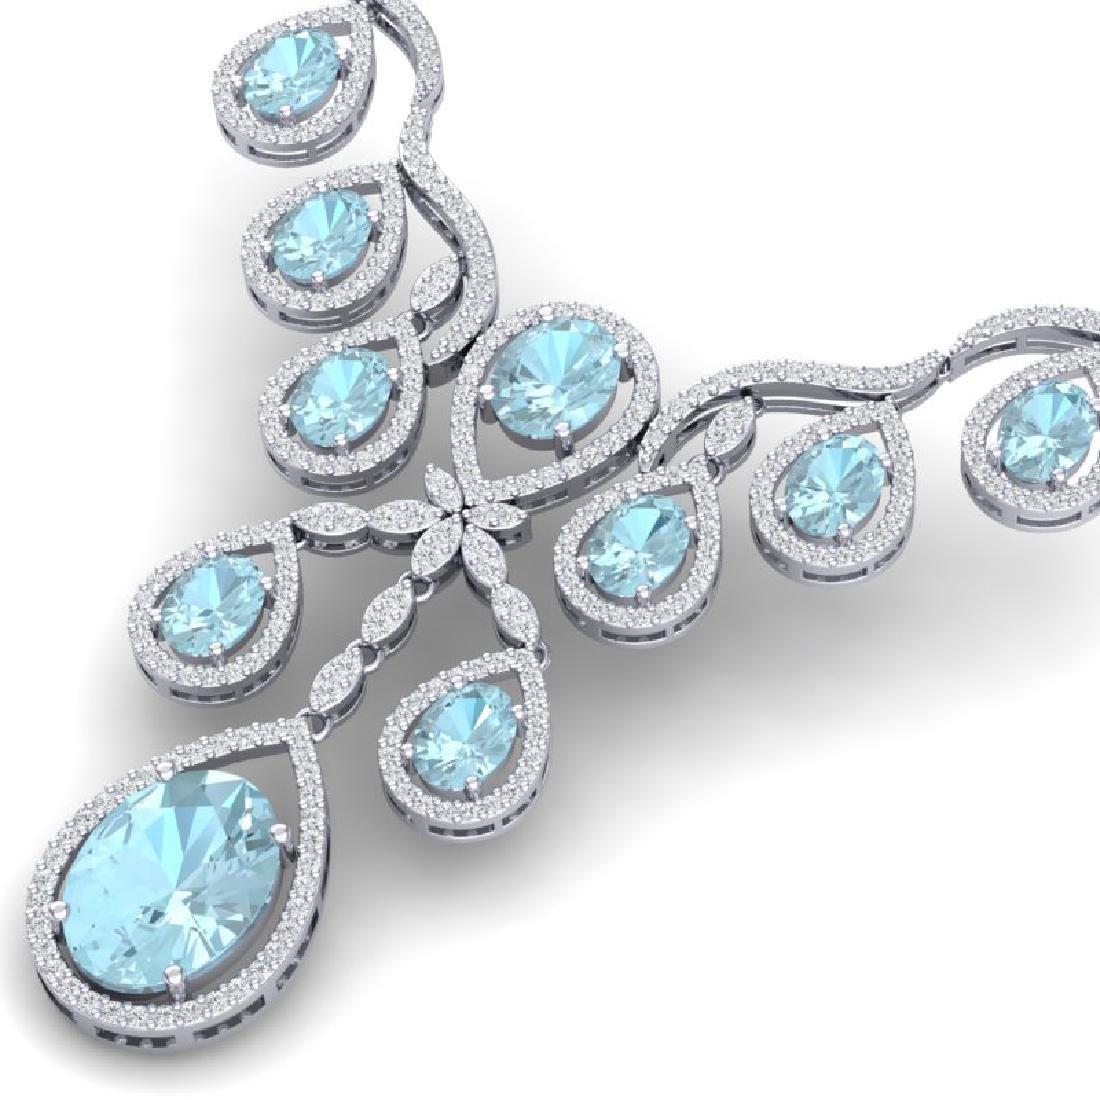 37.91 CTW Royalty Sky Topaz & VS Diamond Necklace 18K - 2